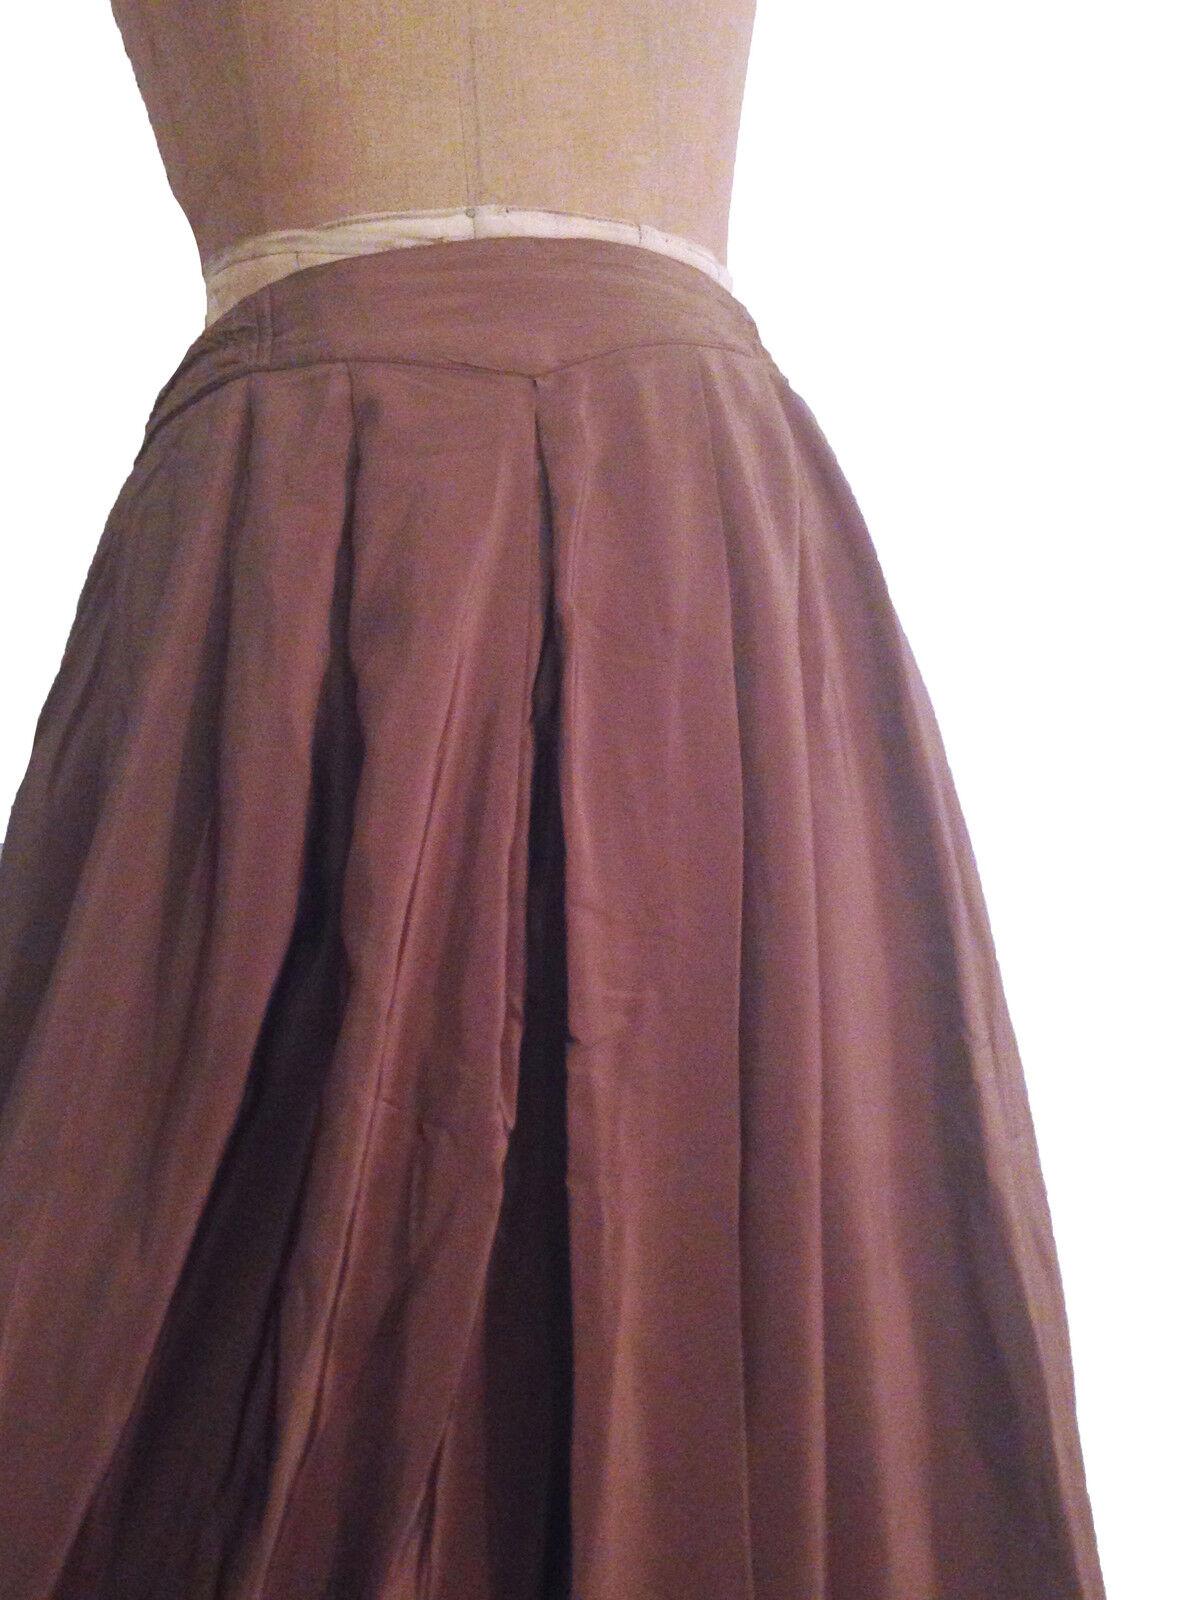 KHAKI Green PURE SILK Full Length PLEATED skirt -Size14- L XL